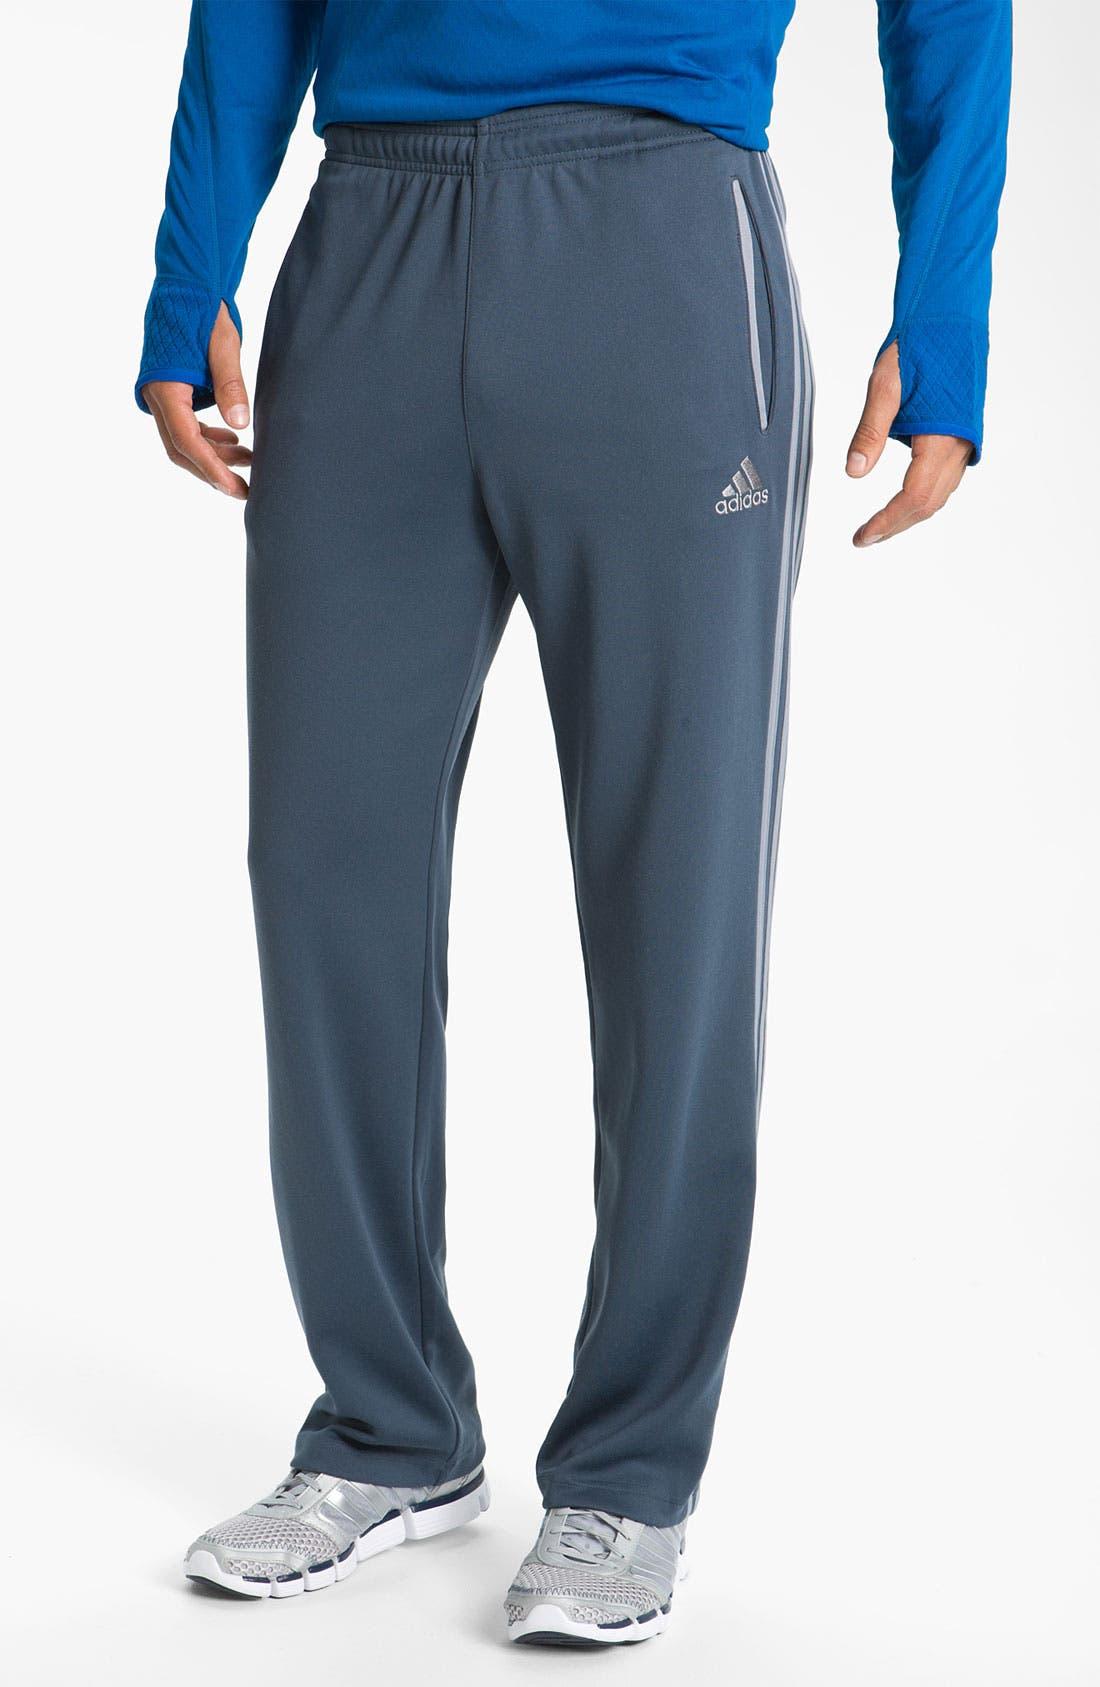 Alternate Image 1 Selected - adidas 'Ultimate' Track Pants